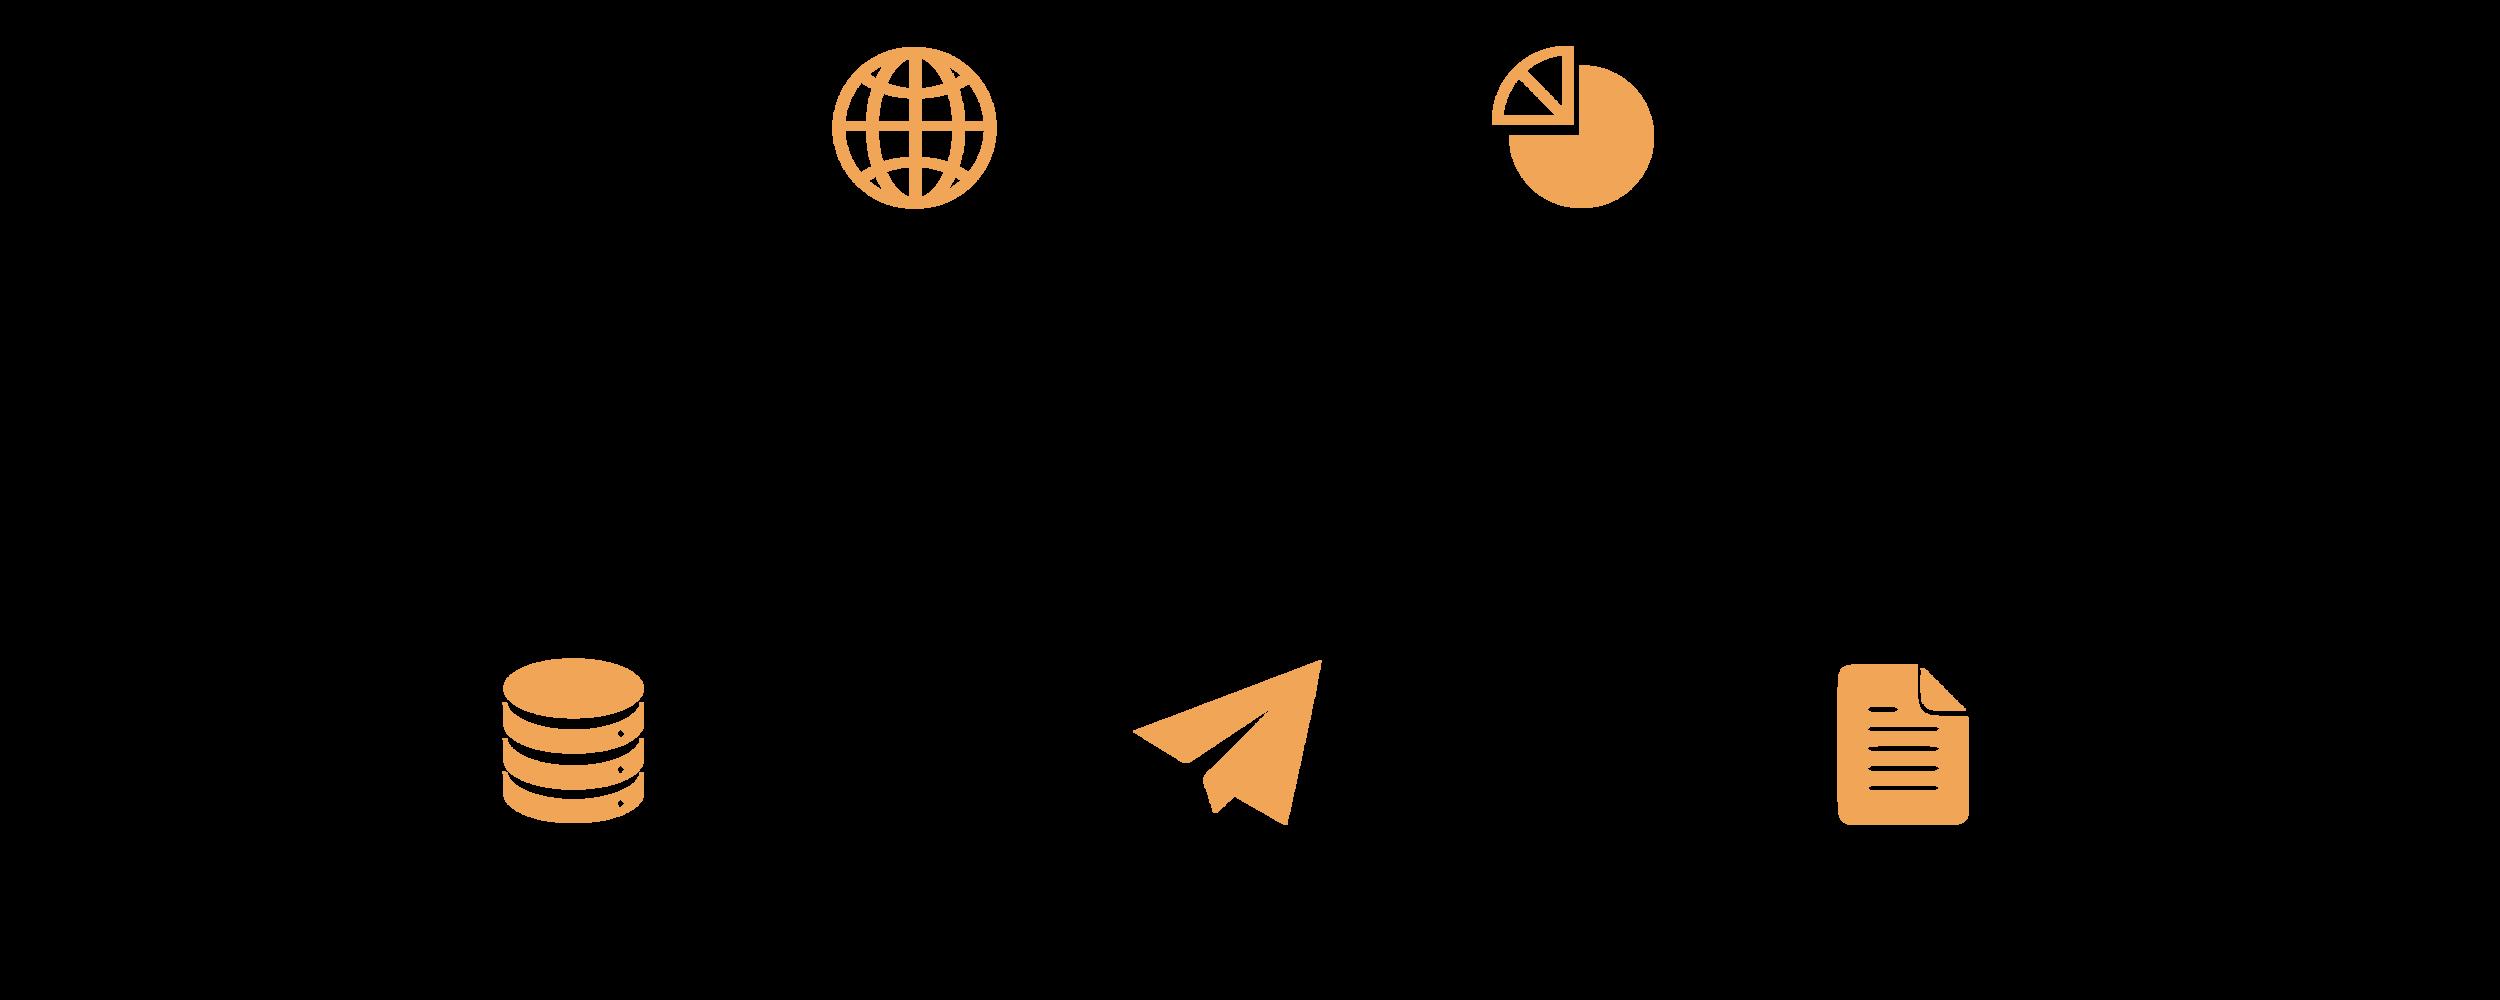 asset orbital data analytics web software pipeline reports management